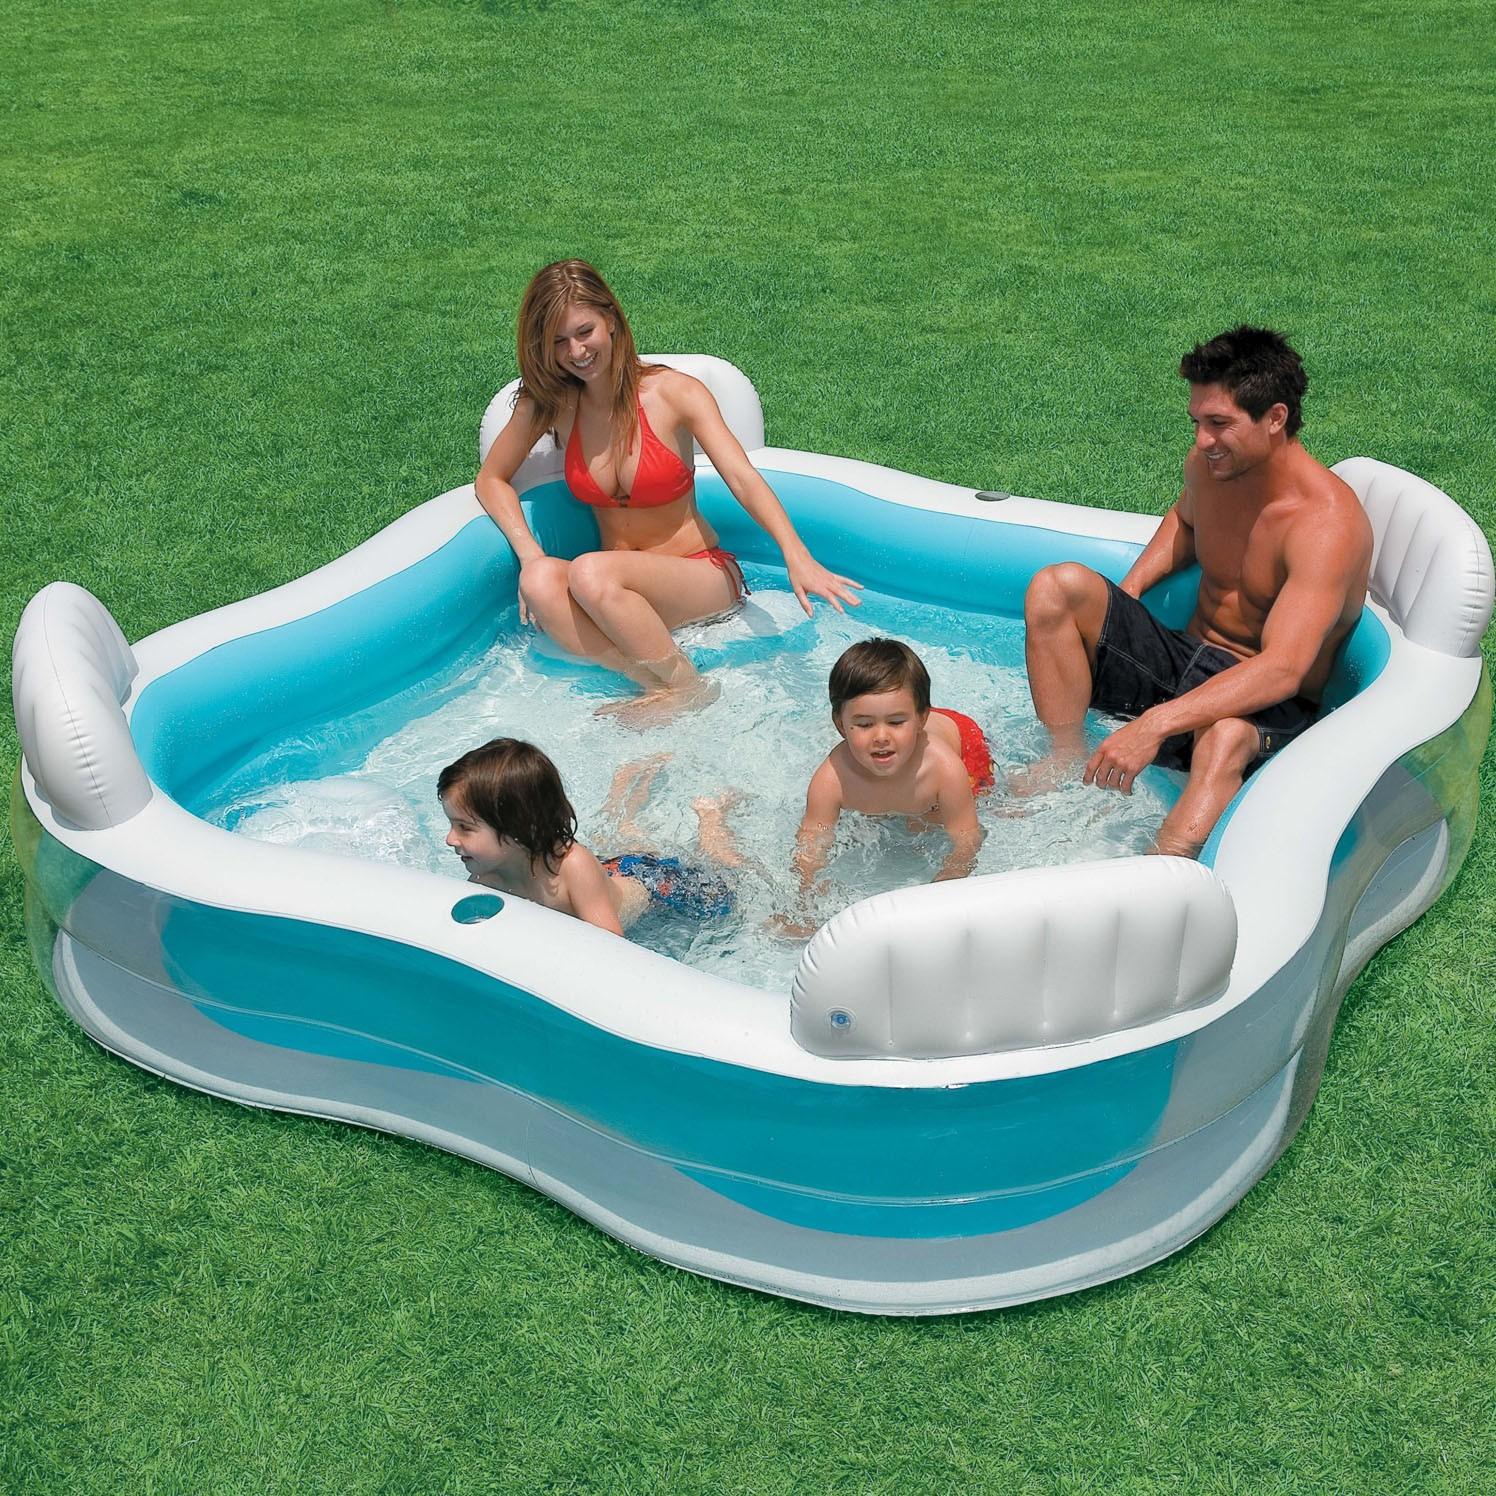 Piscina gonflabila Intex Swim Center 56475, 229 x 229 x 66 cm